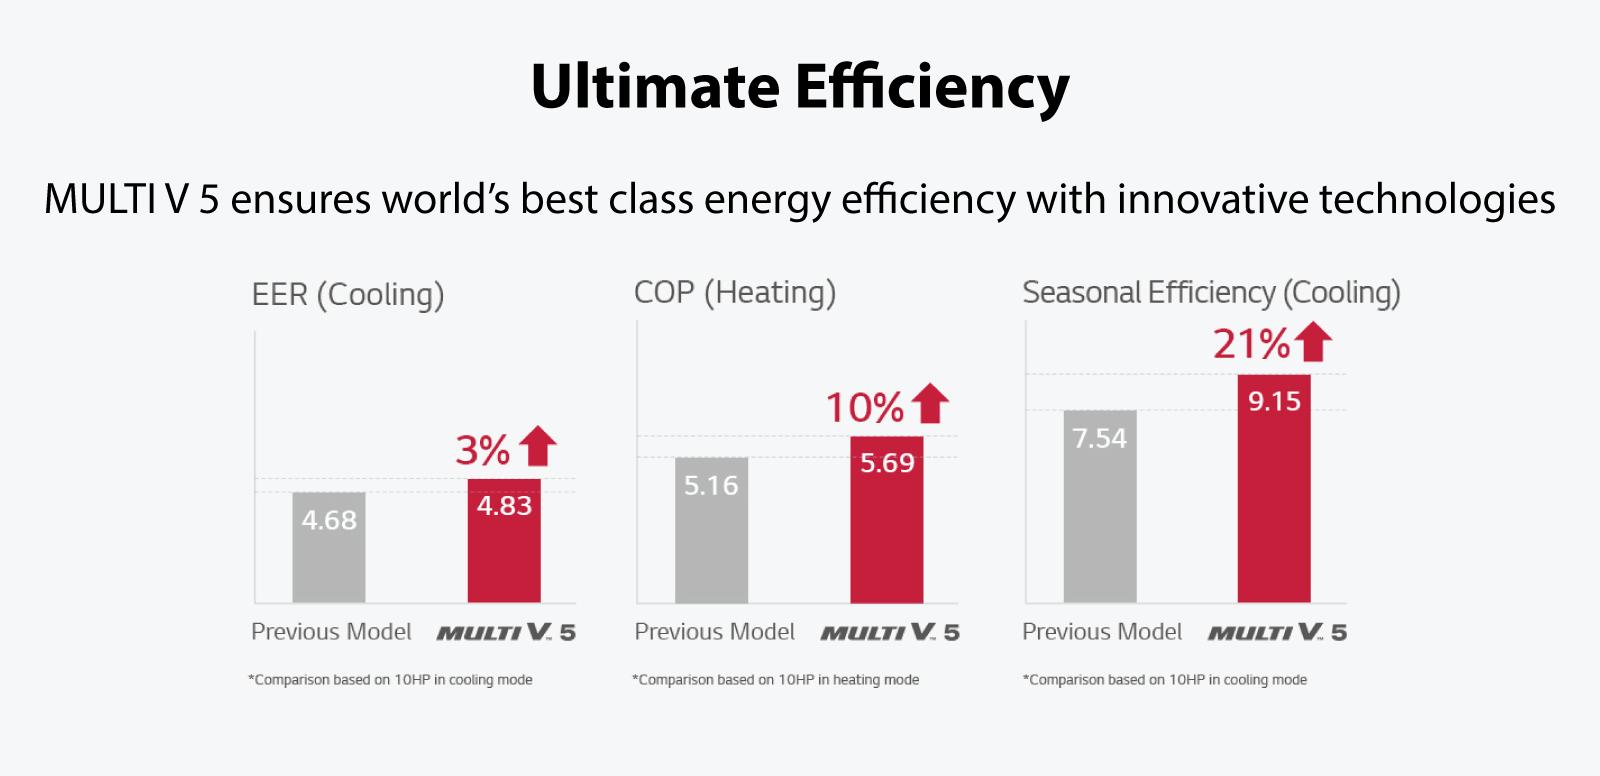 VRF LG Multi V5 Ultimate efficiency- Ecovair, Multi V5-LG Ultimate efficiency- Ecovair Energy Efficient air conditioning HVAC